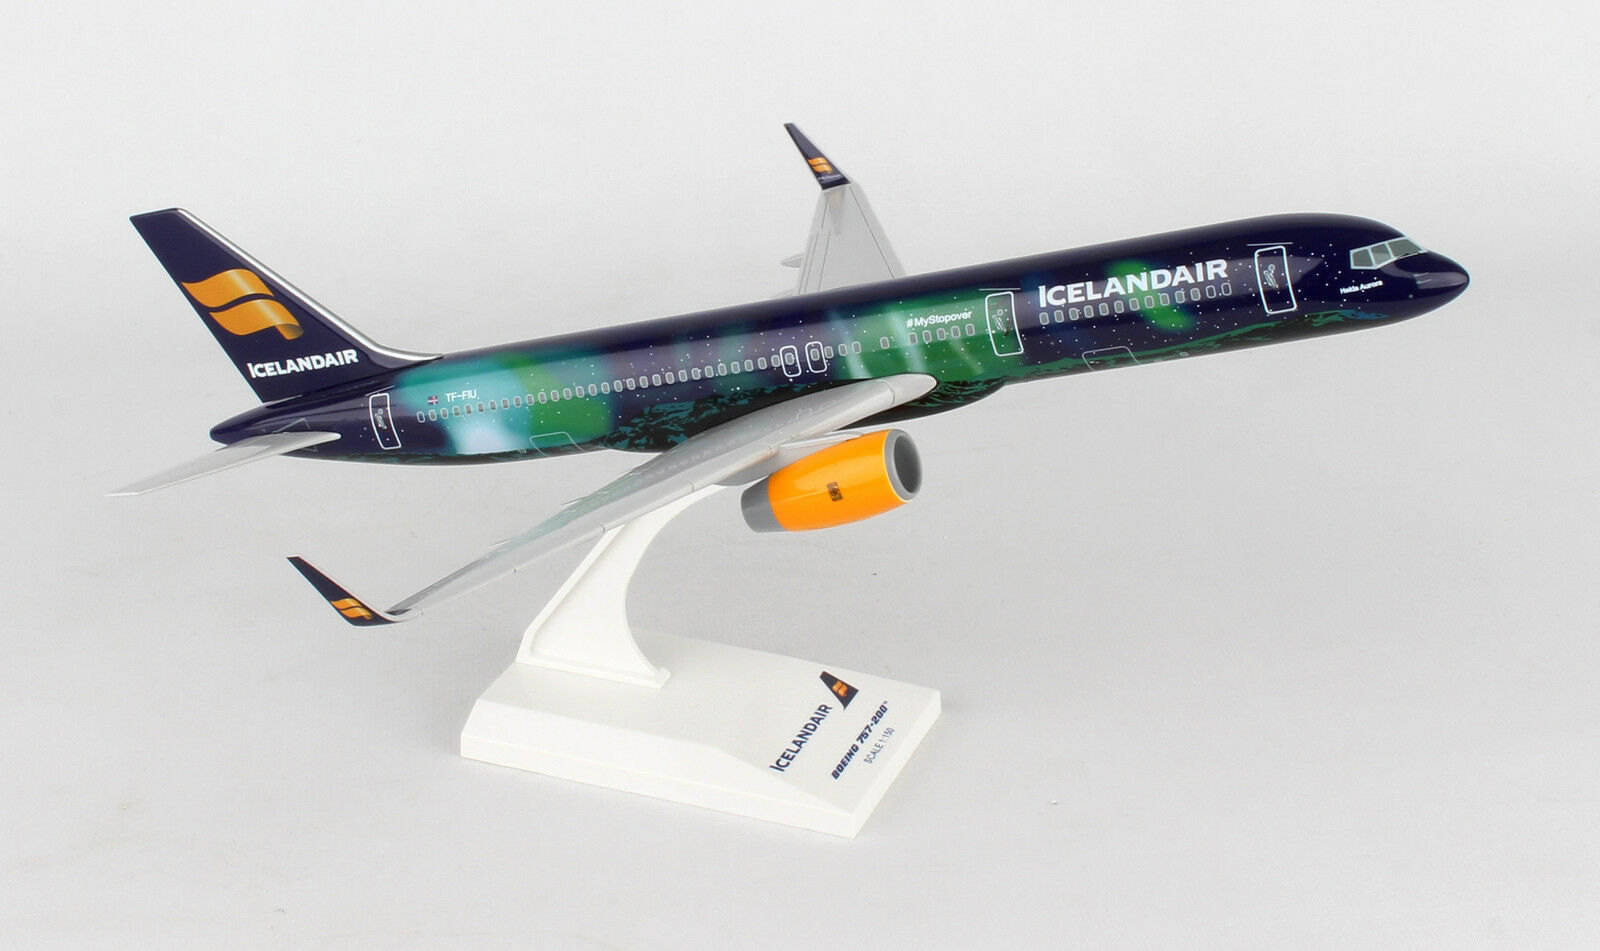 SkyMarks Icelandair  Aurora  Boeing B757-200W 1 150